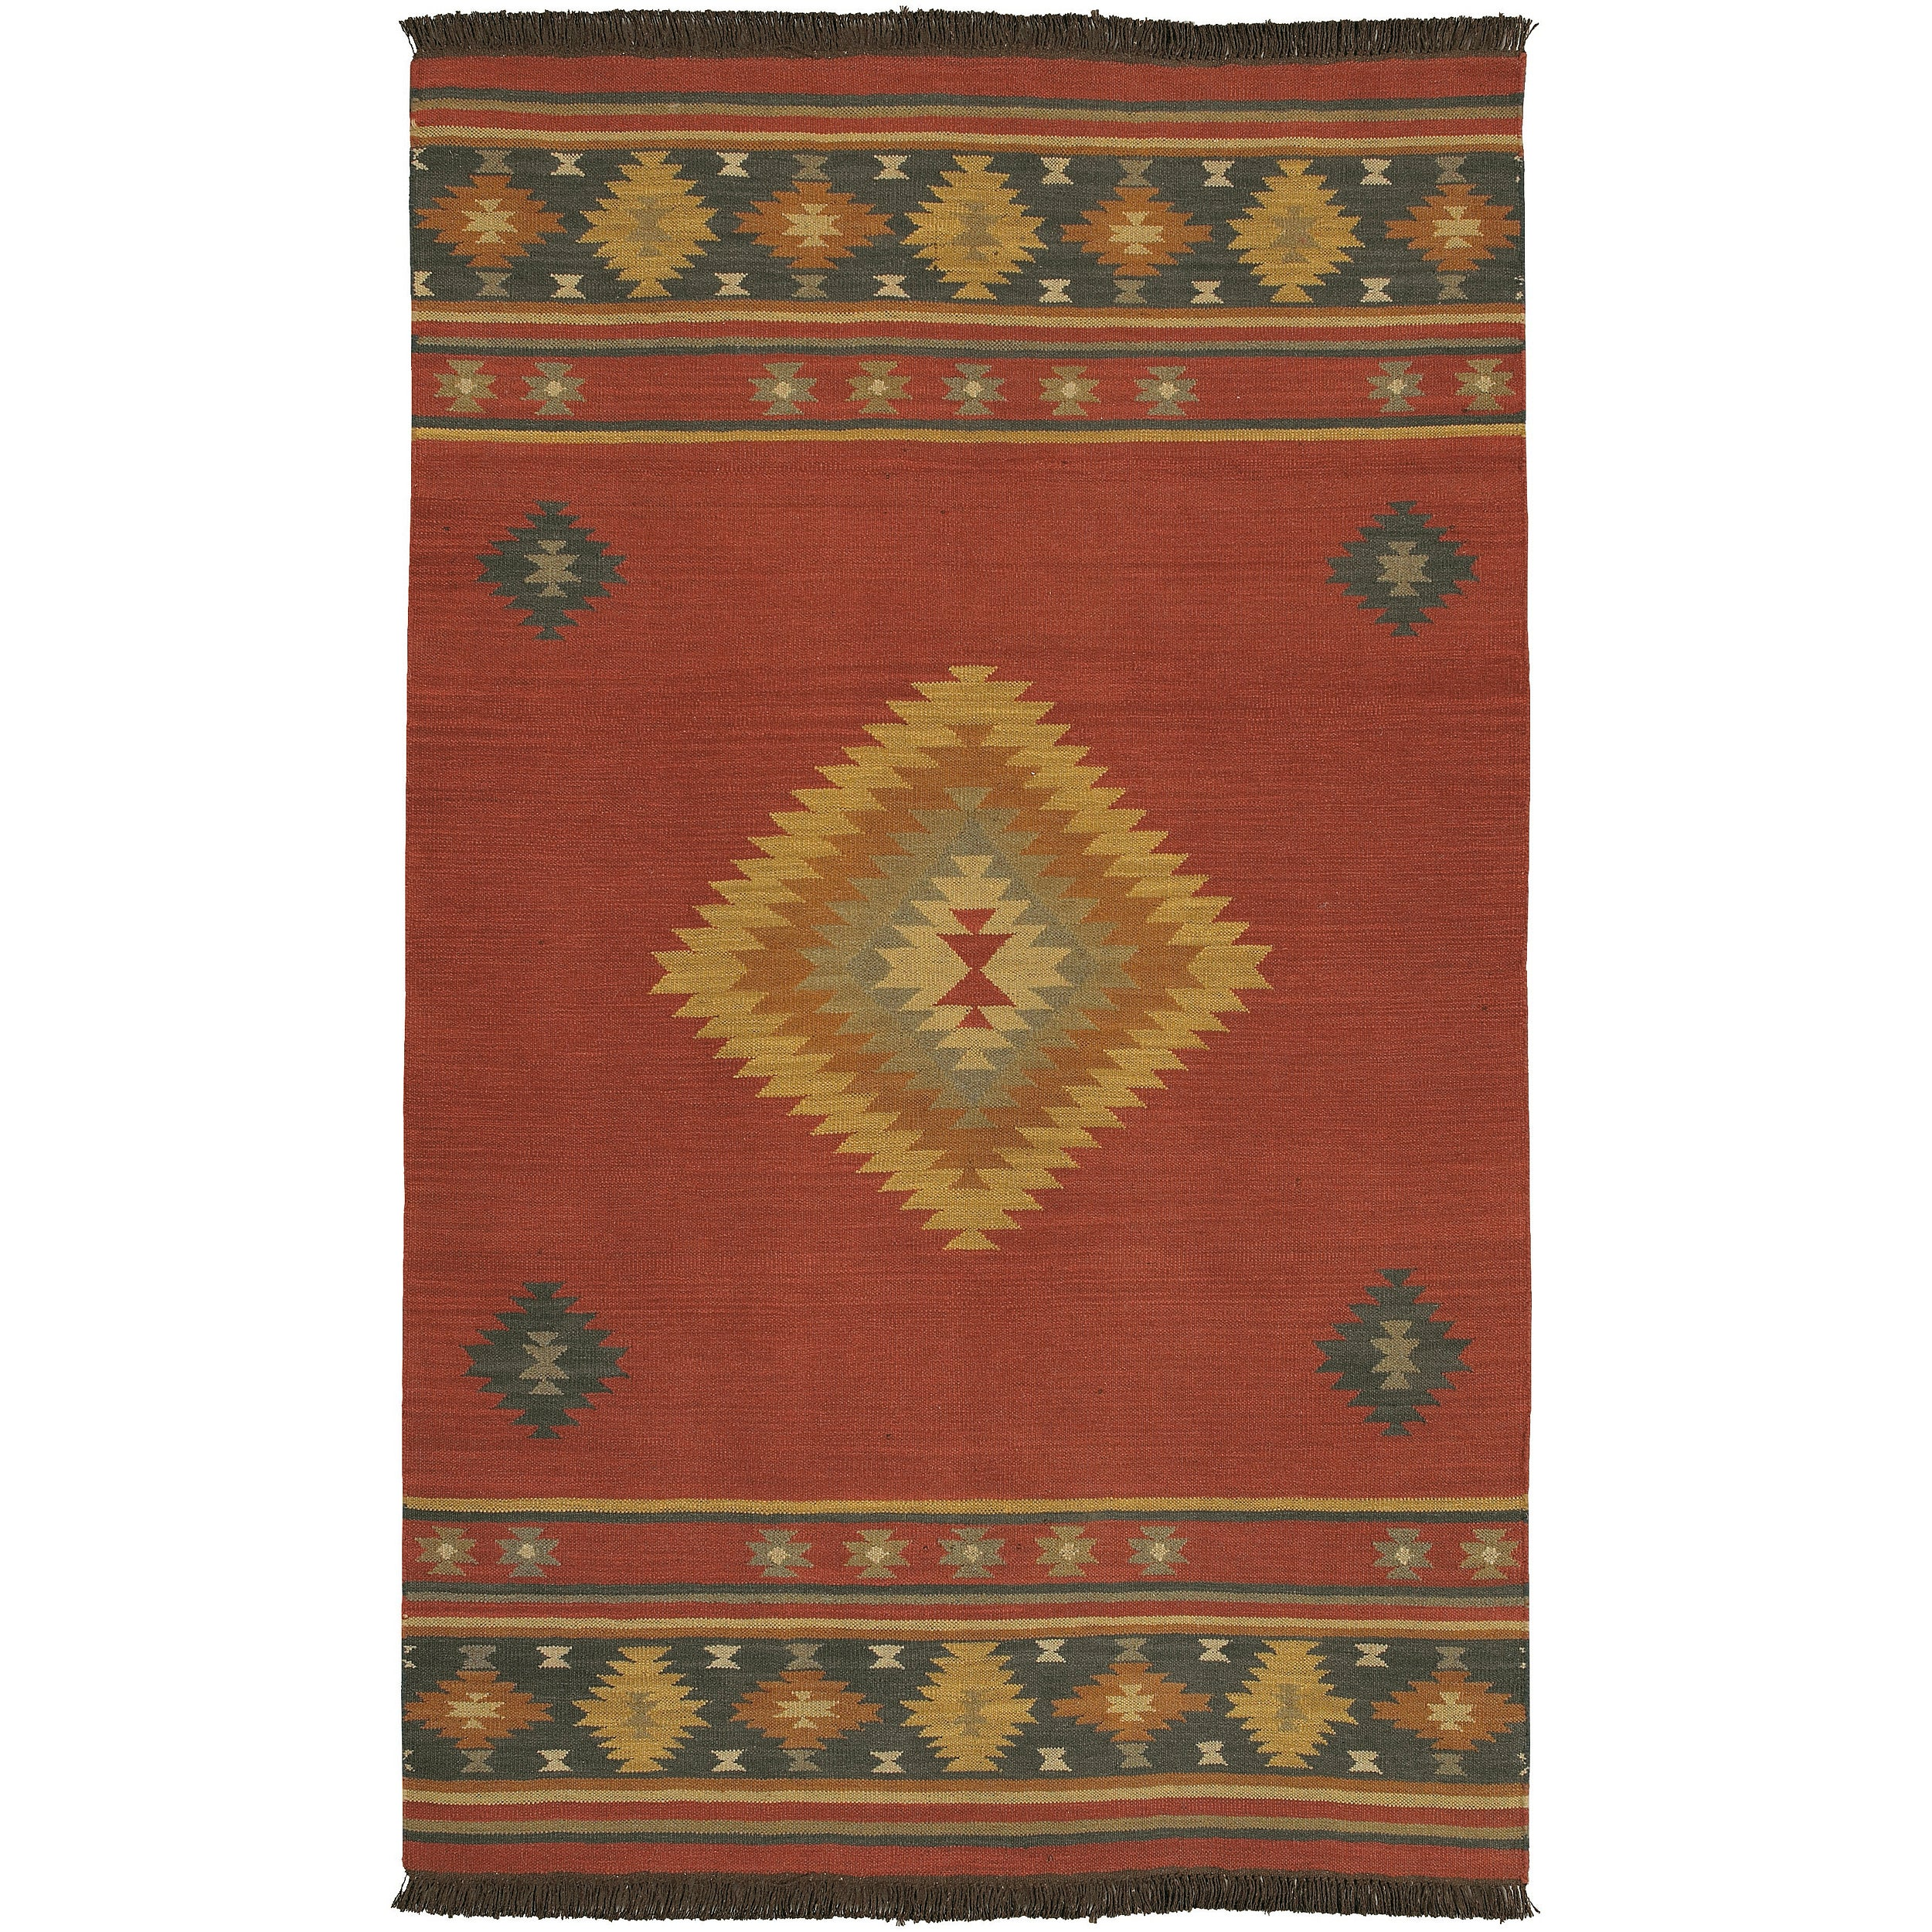 Home Decor 101 Hand Woven Burgundy Southwestern Aztec Acero Wool Rug 3 6